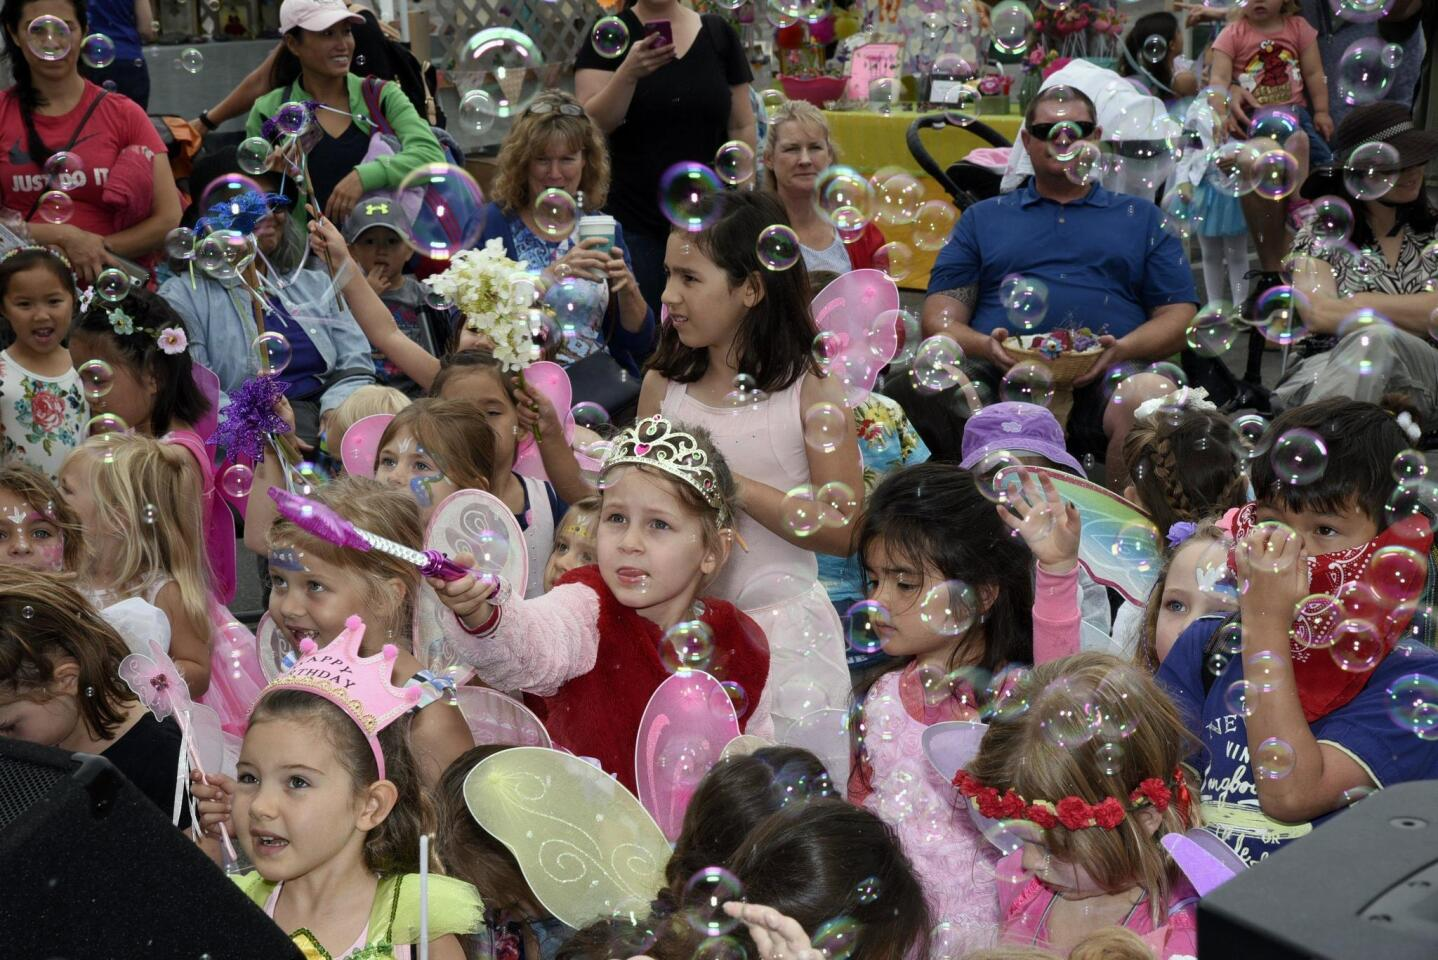 The bubble machine was popular